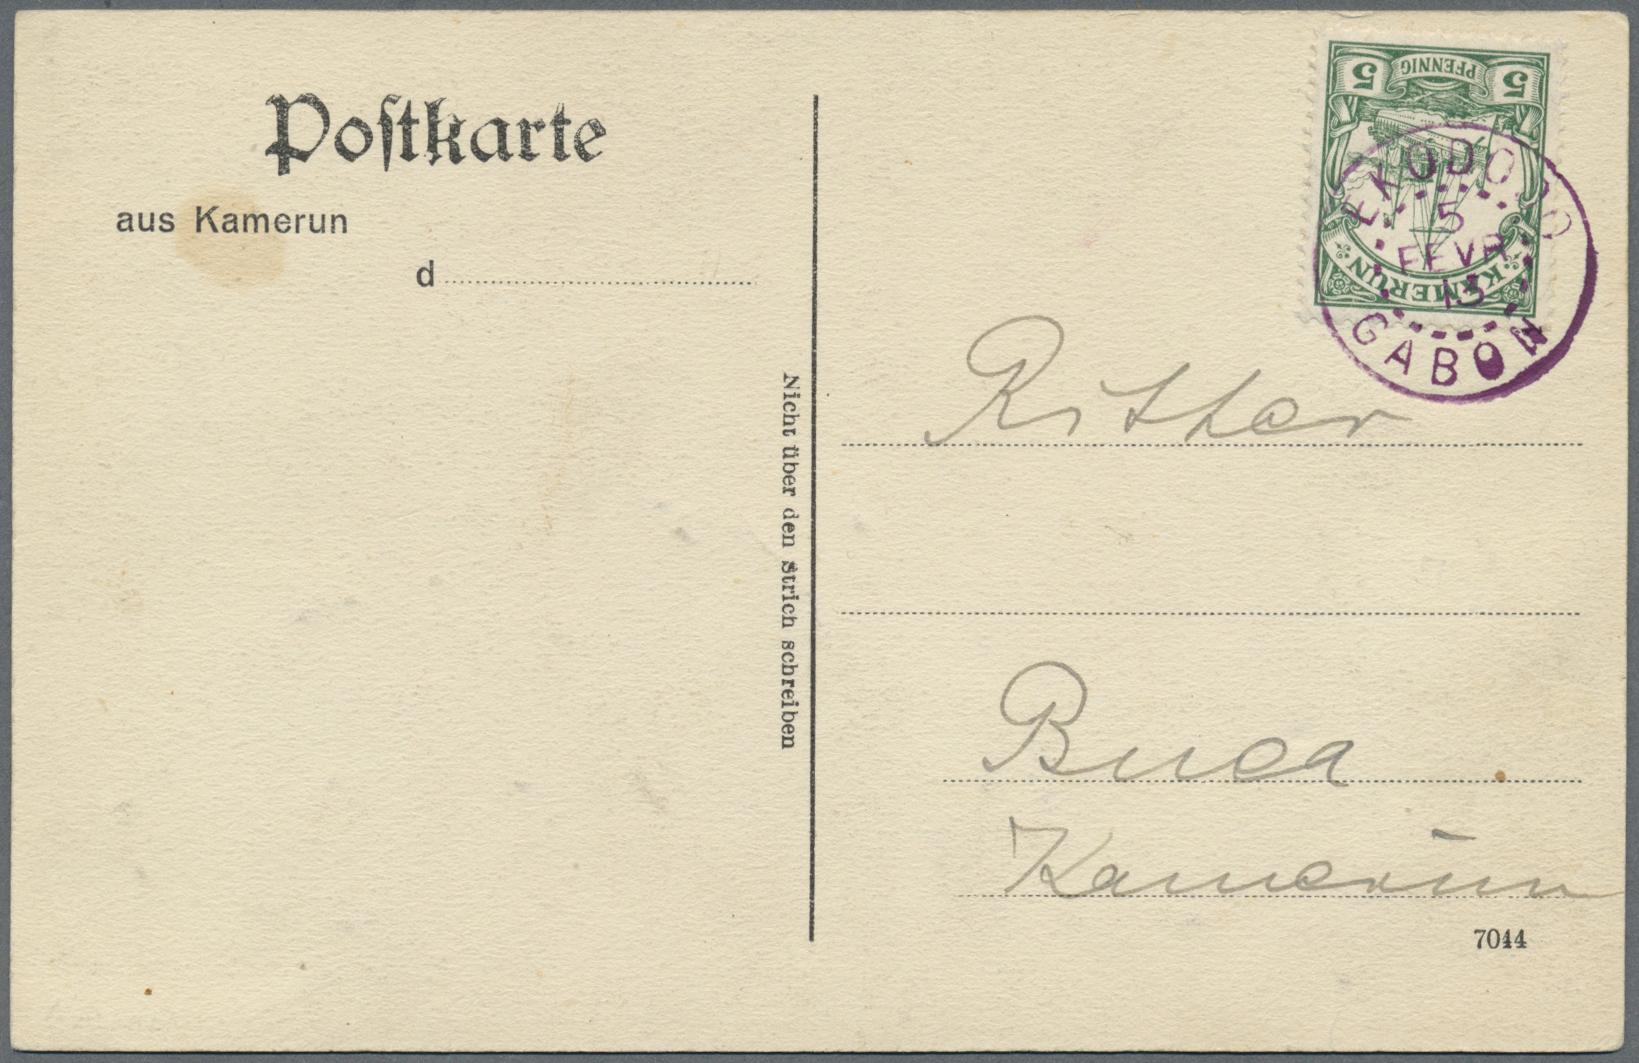 Lot 22431 - Deutsche Kolonien - Kamerun - Stempel  -  Auktionshaus Christoph Gärtner GmbH & Co. KG Single lots Germany + Picture Postcards. Auction #39 Day 5